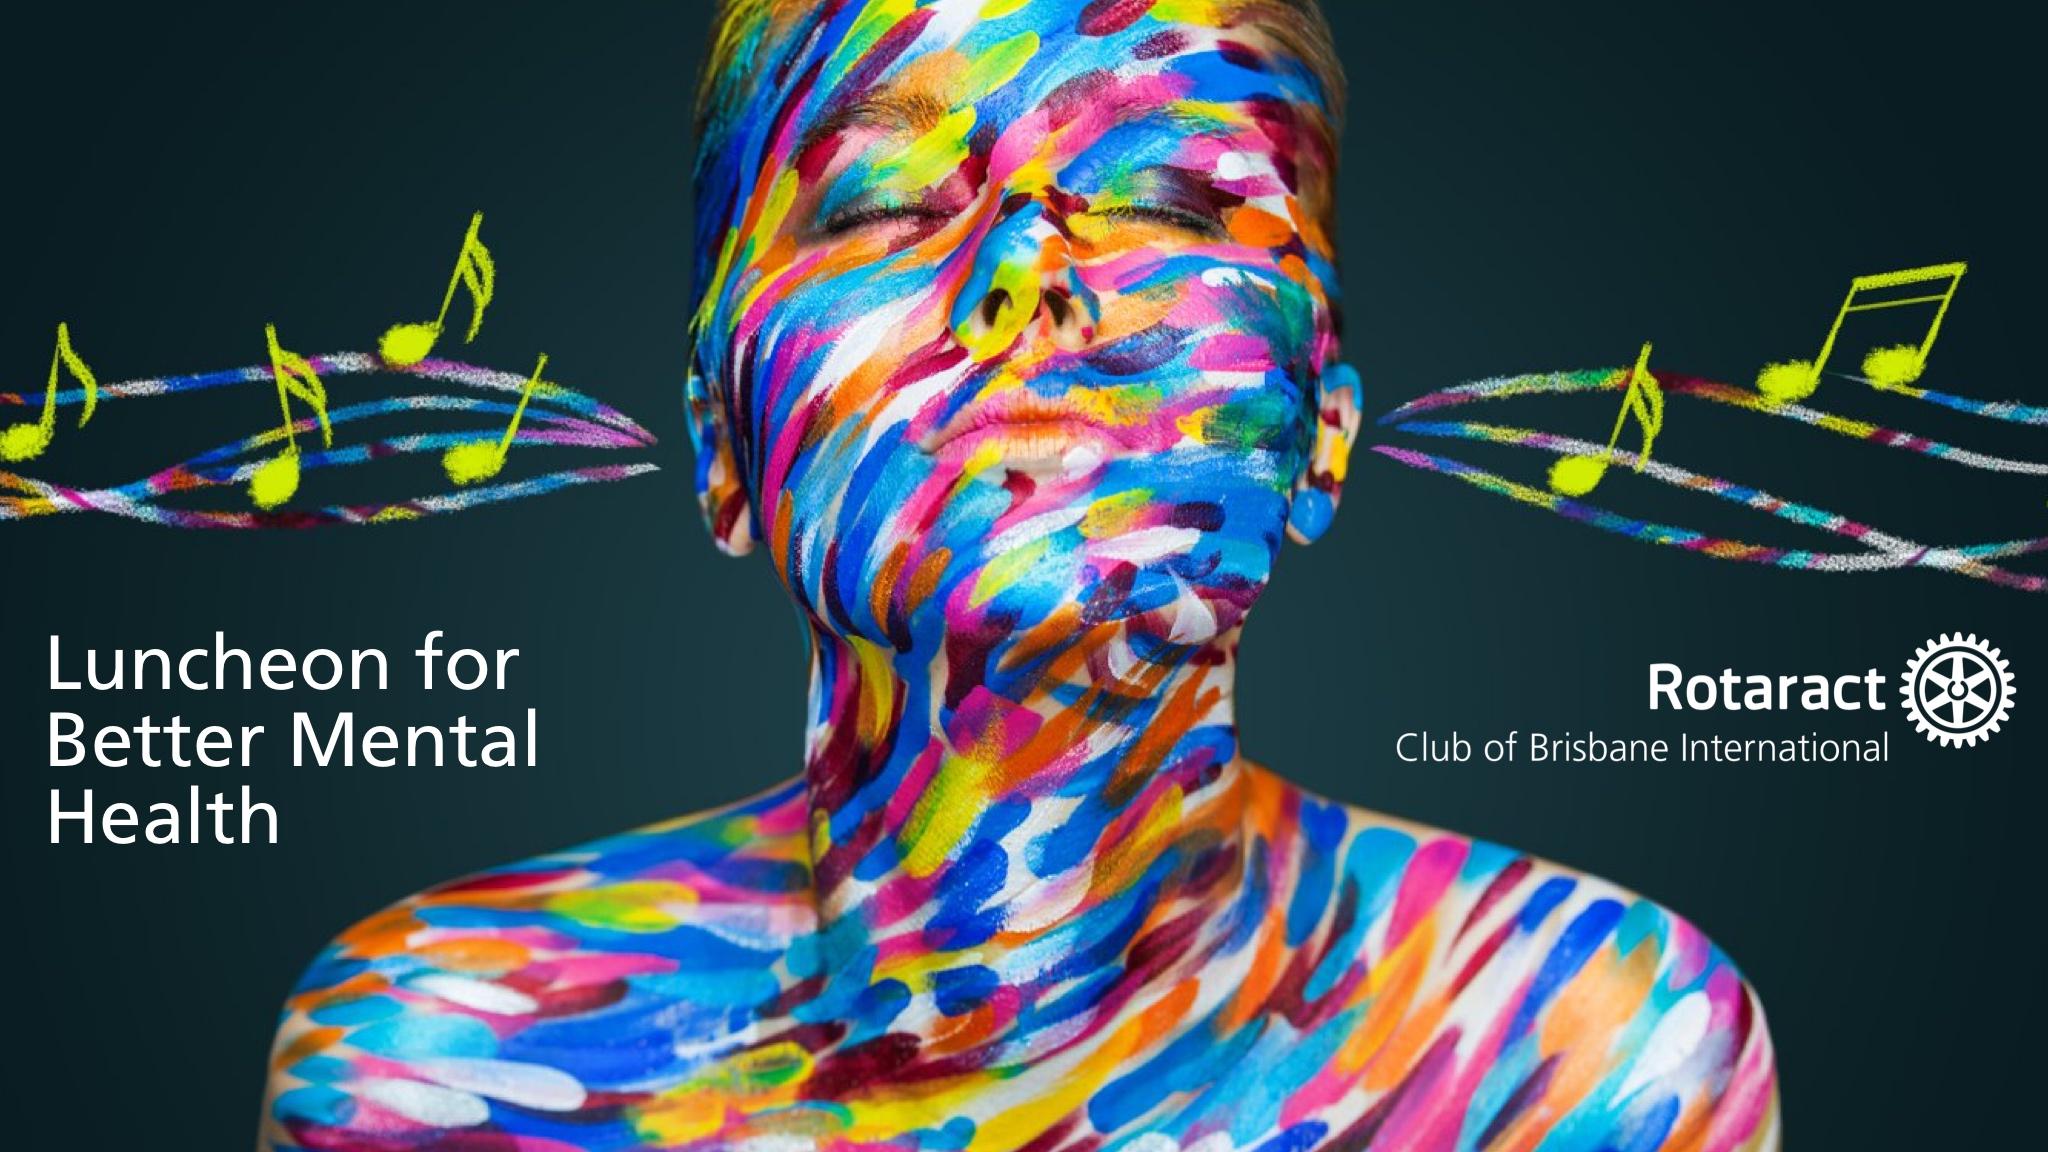 rCBI - luncheon for better mental health - web use - 16_9.jpg